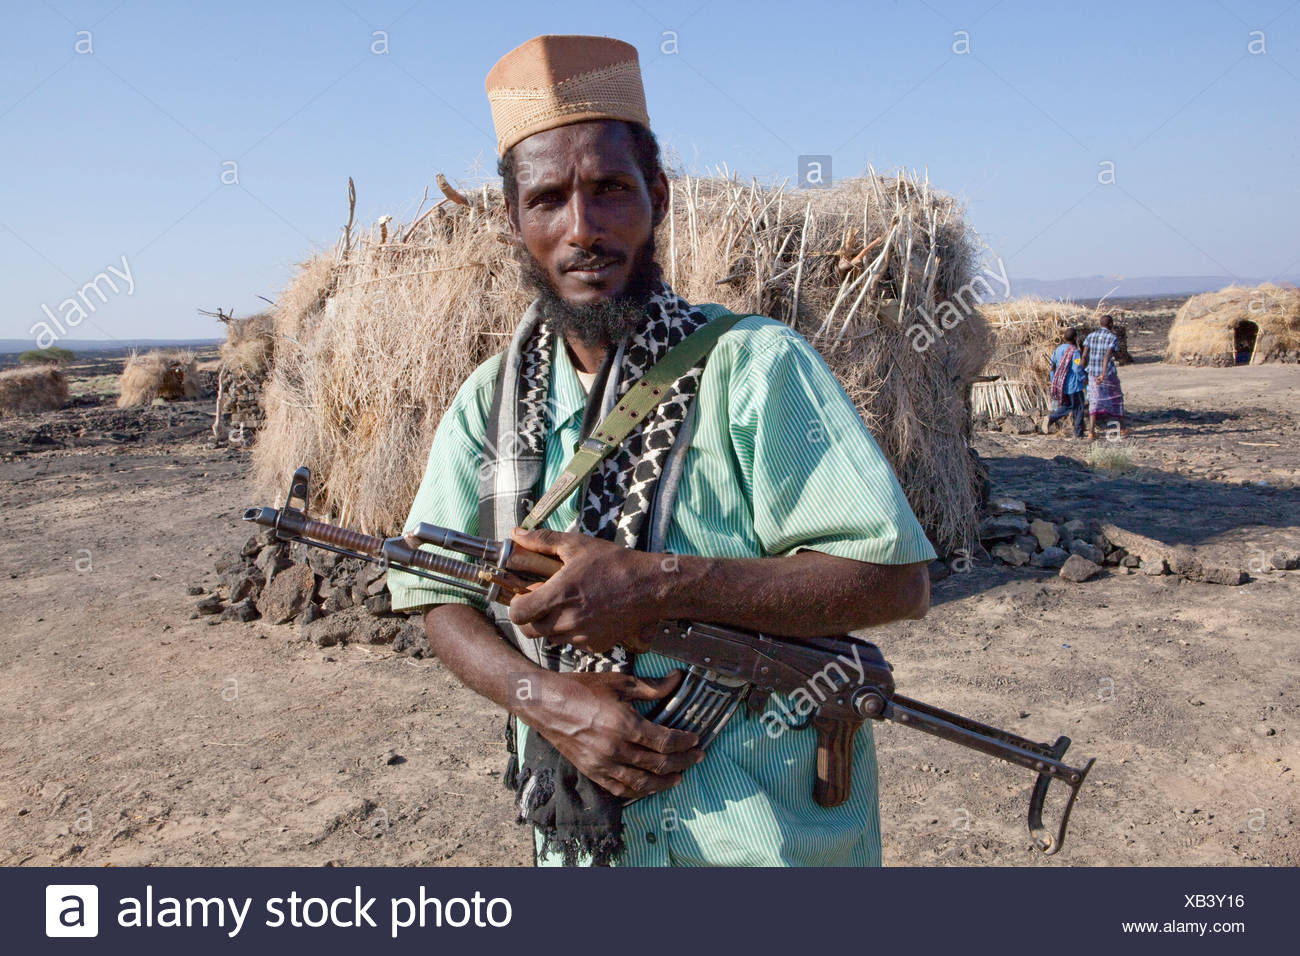 Vulcano Ertale, volcanical, Africa, capanna, guardia, uomo, mitragliatore Immagini Stock